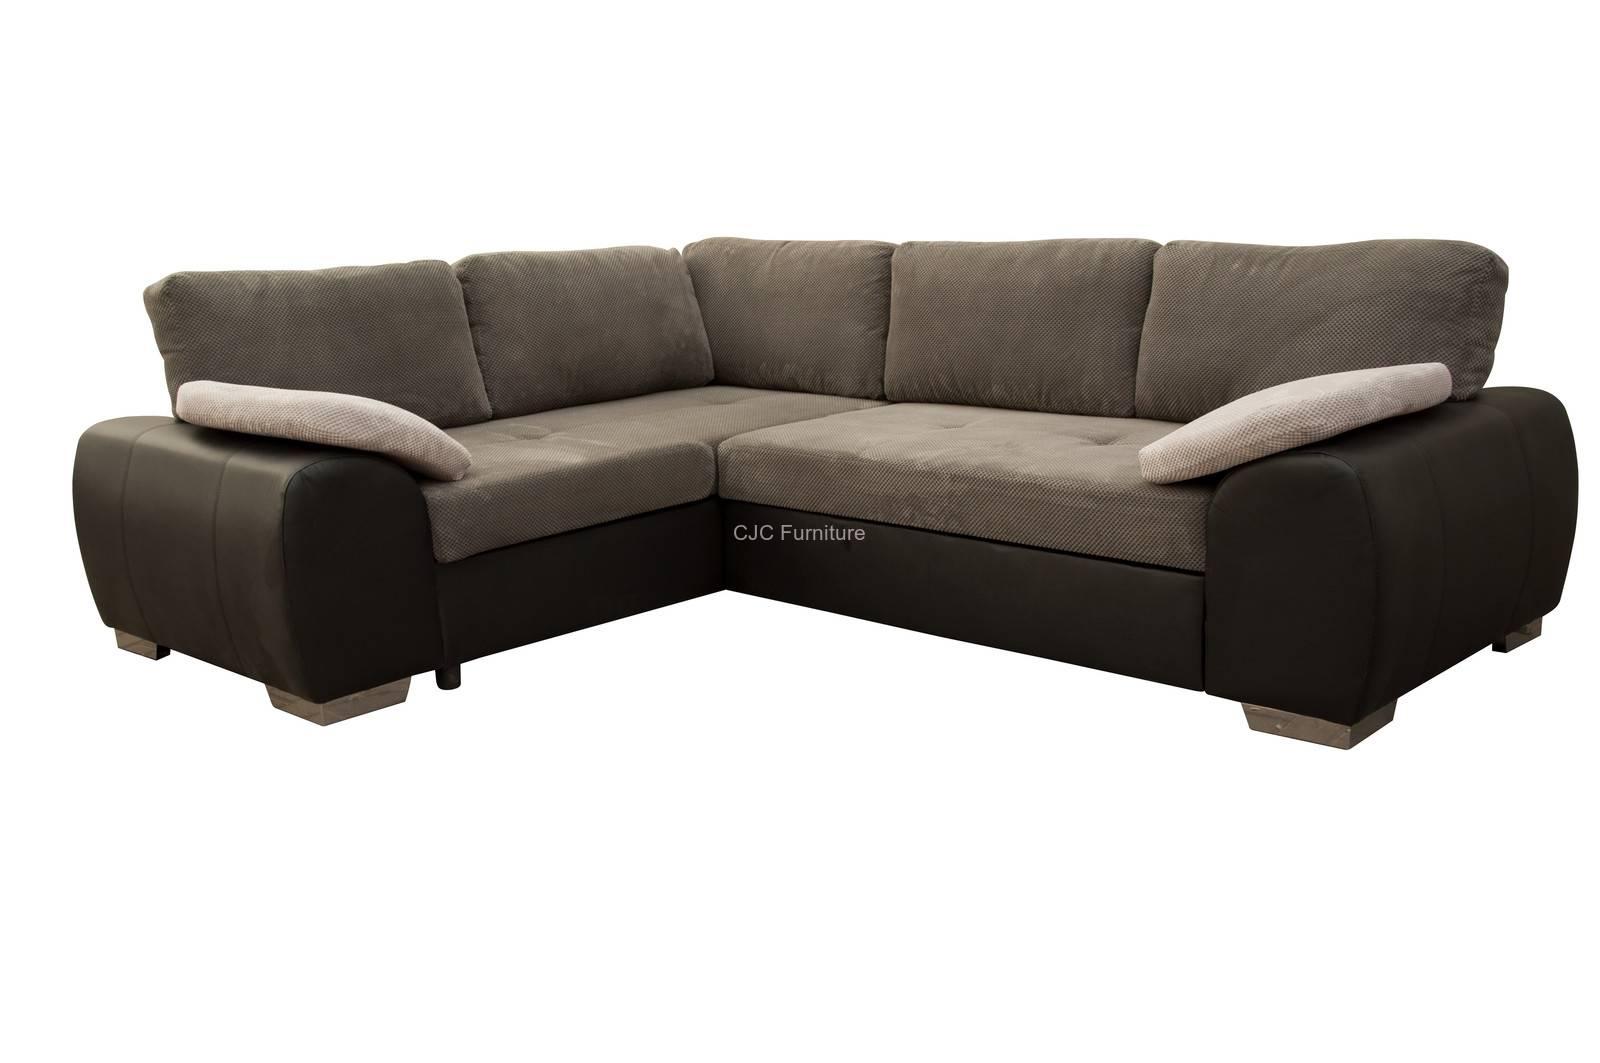 Birmingham Furniture - Cjcfurniture.co.uk Corner Sofa Beds throughout Fabric Corner Sofa Bed (Image 5 of 30)